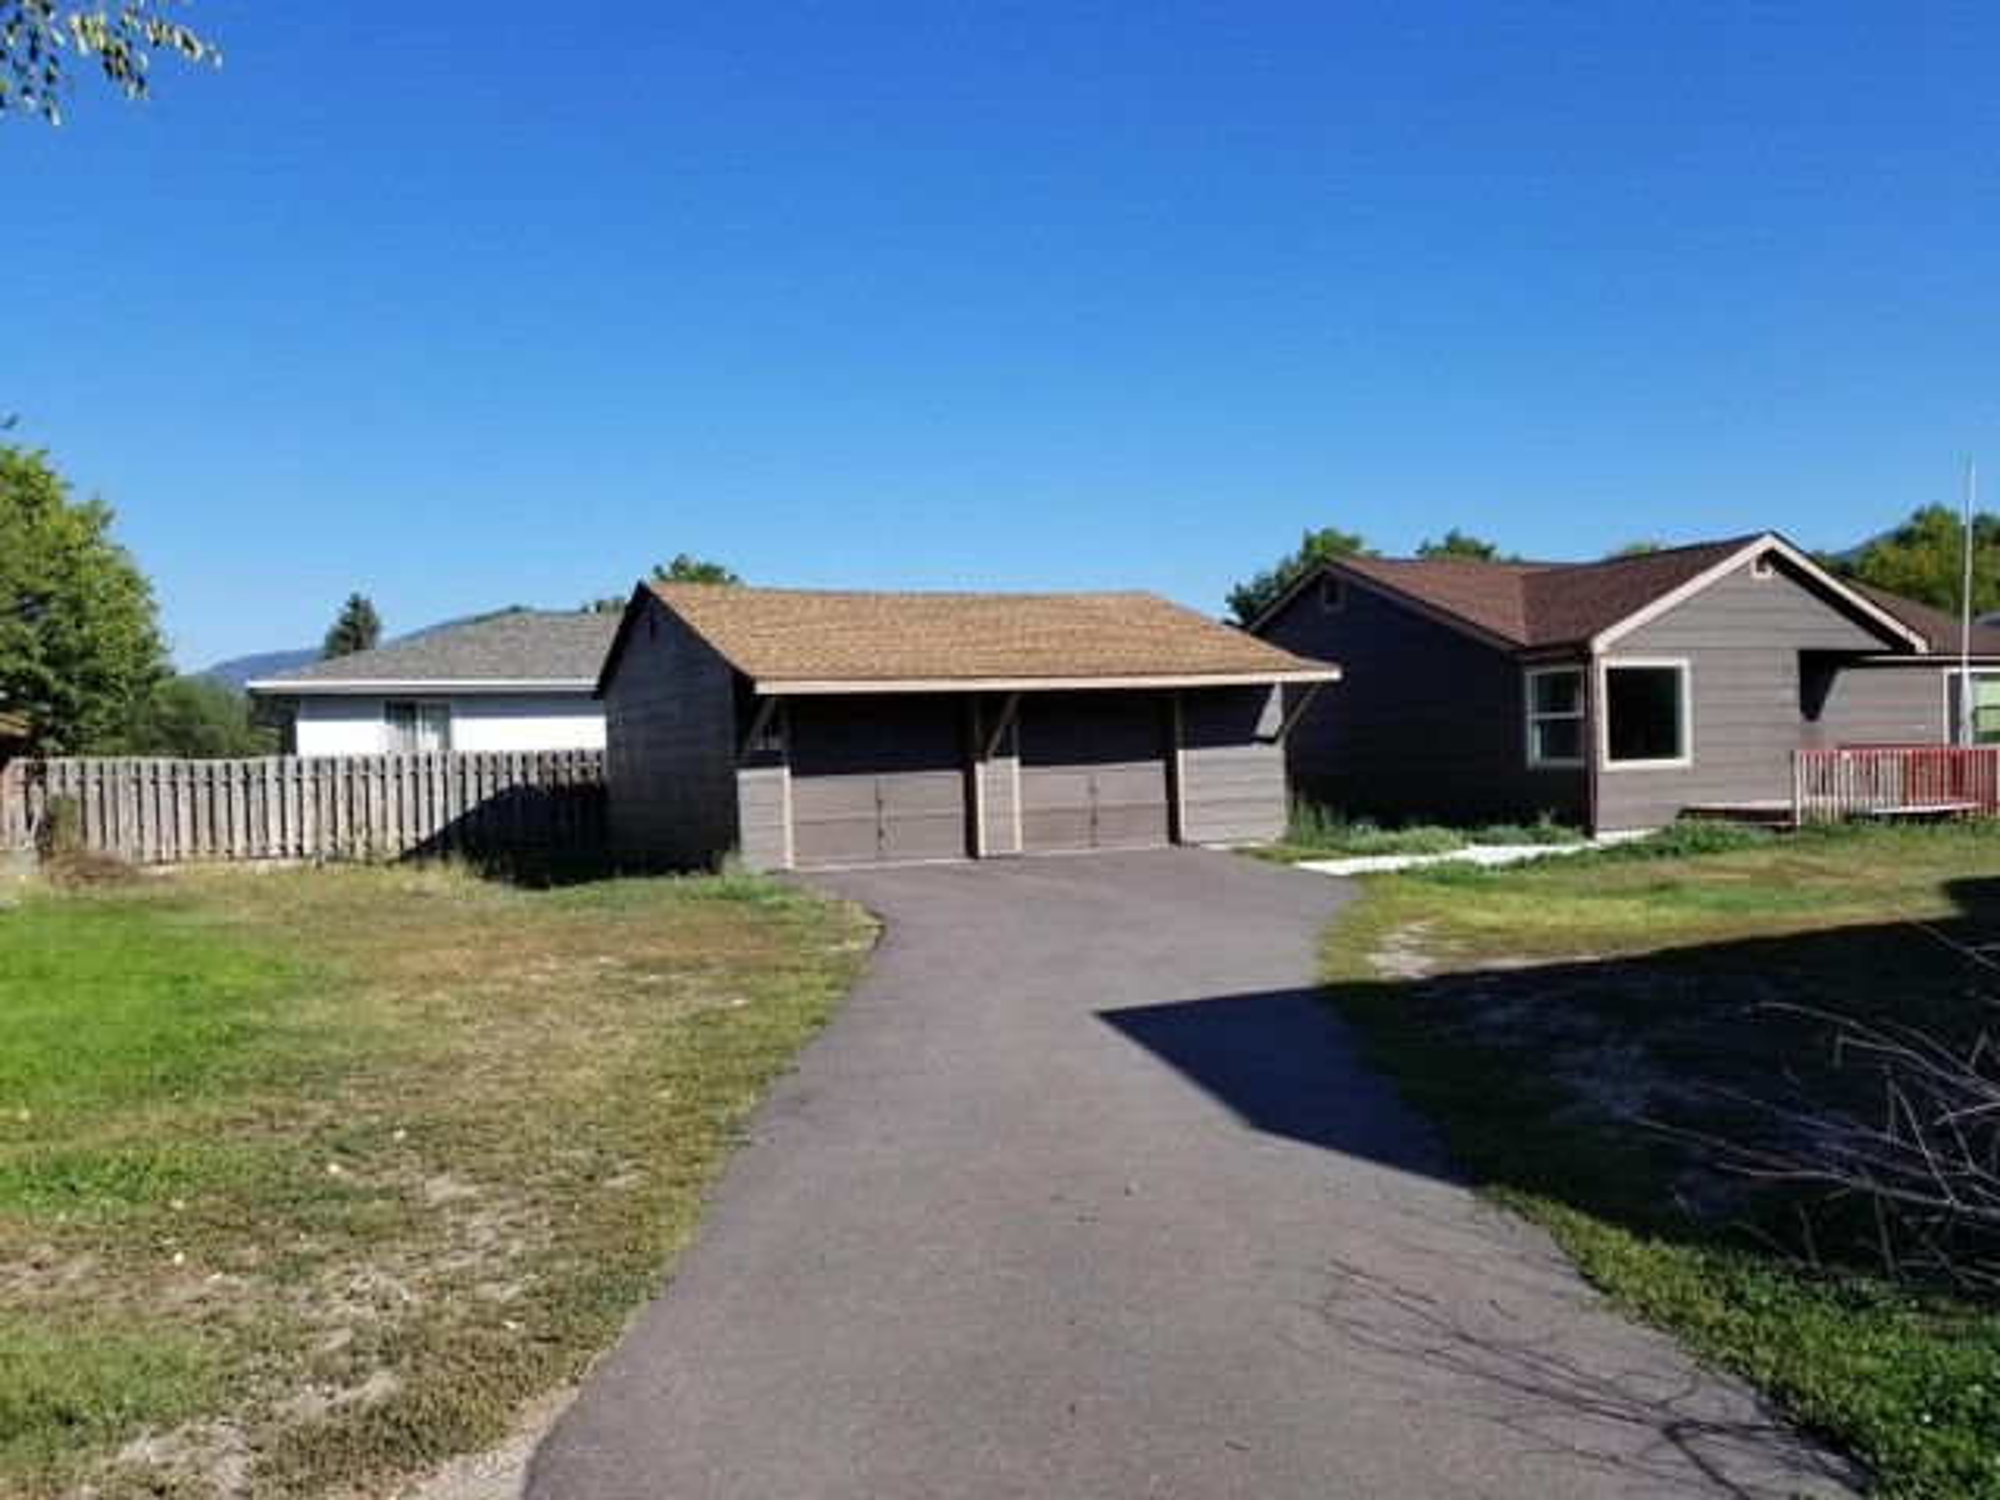 2131 South 8th Street West, Missoula, MT 59801